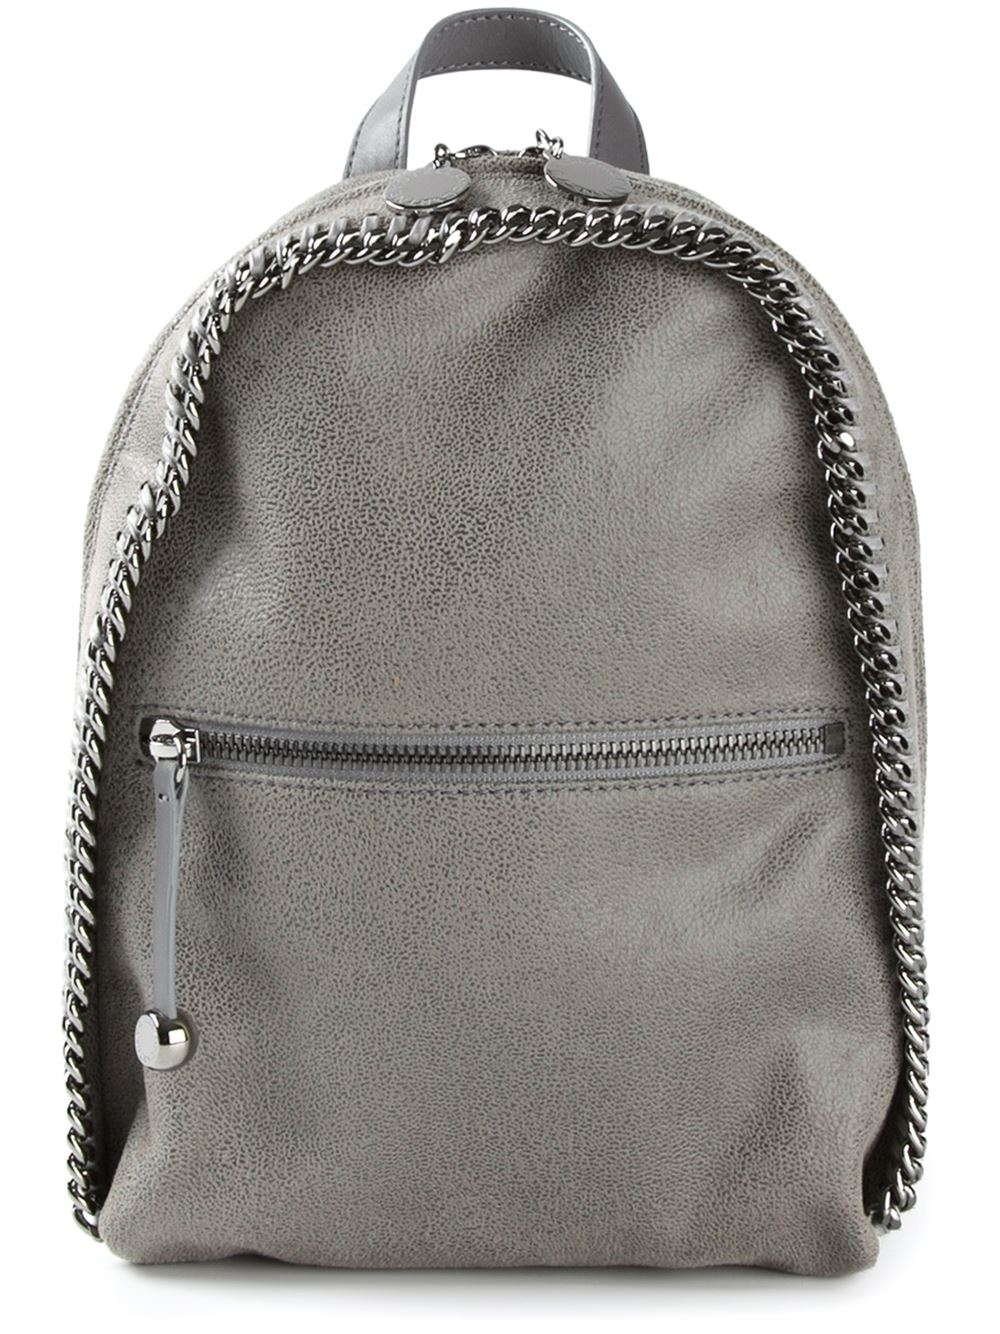 stella mccartney 39 falabella 39 backpack in gray grey lyst. Black Bedroom Furniture Sets. Home Design Ideas